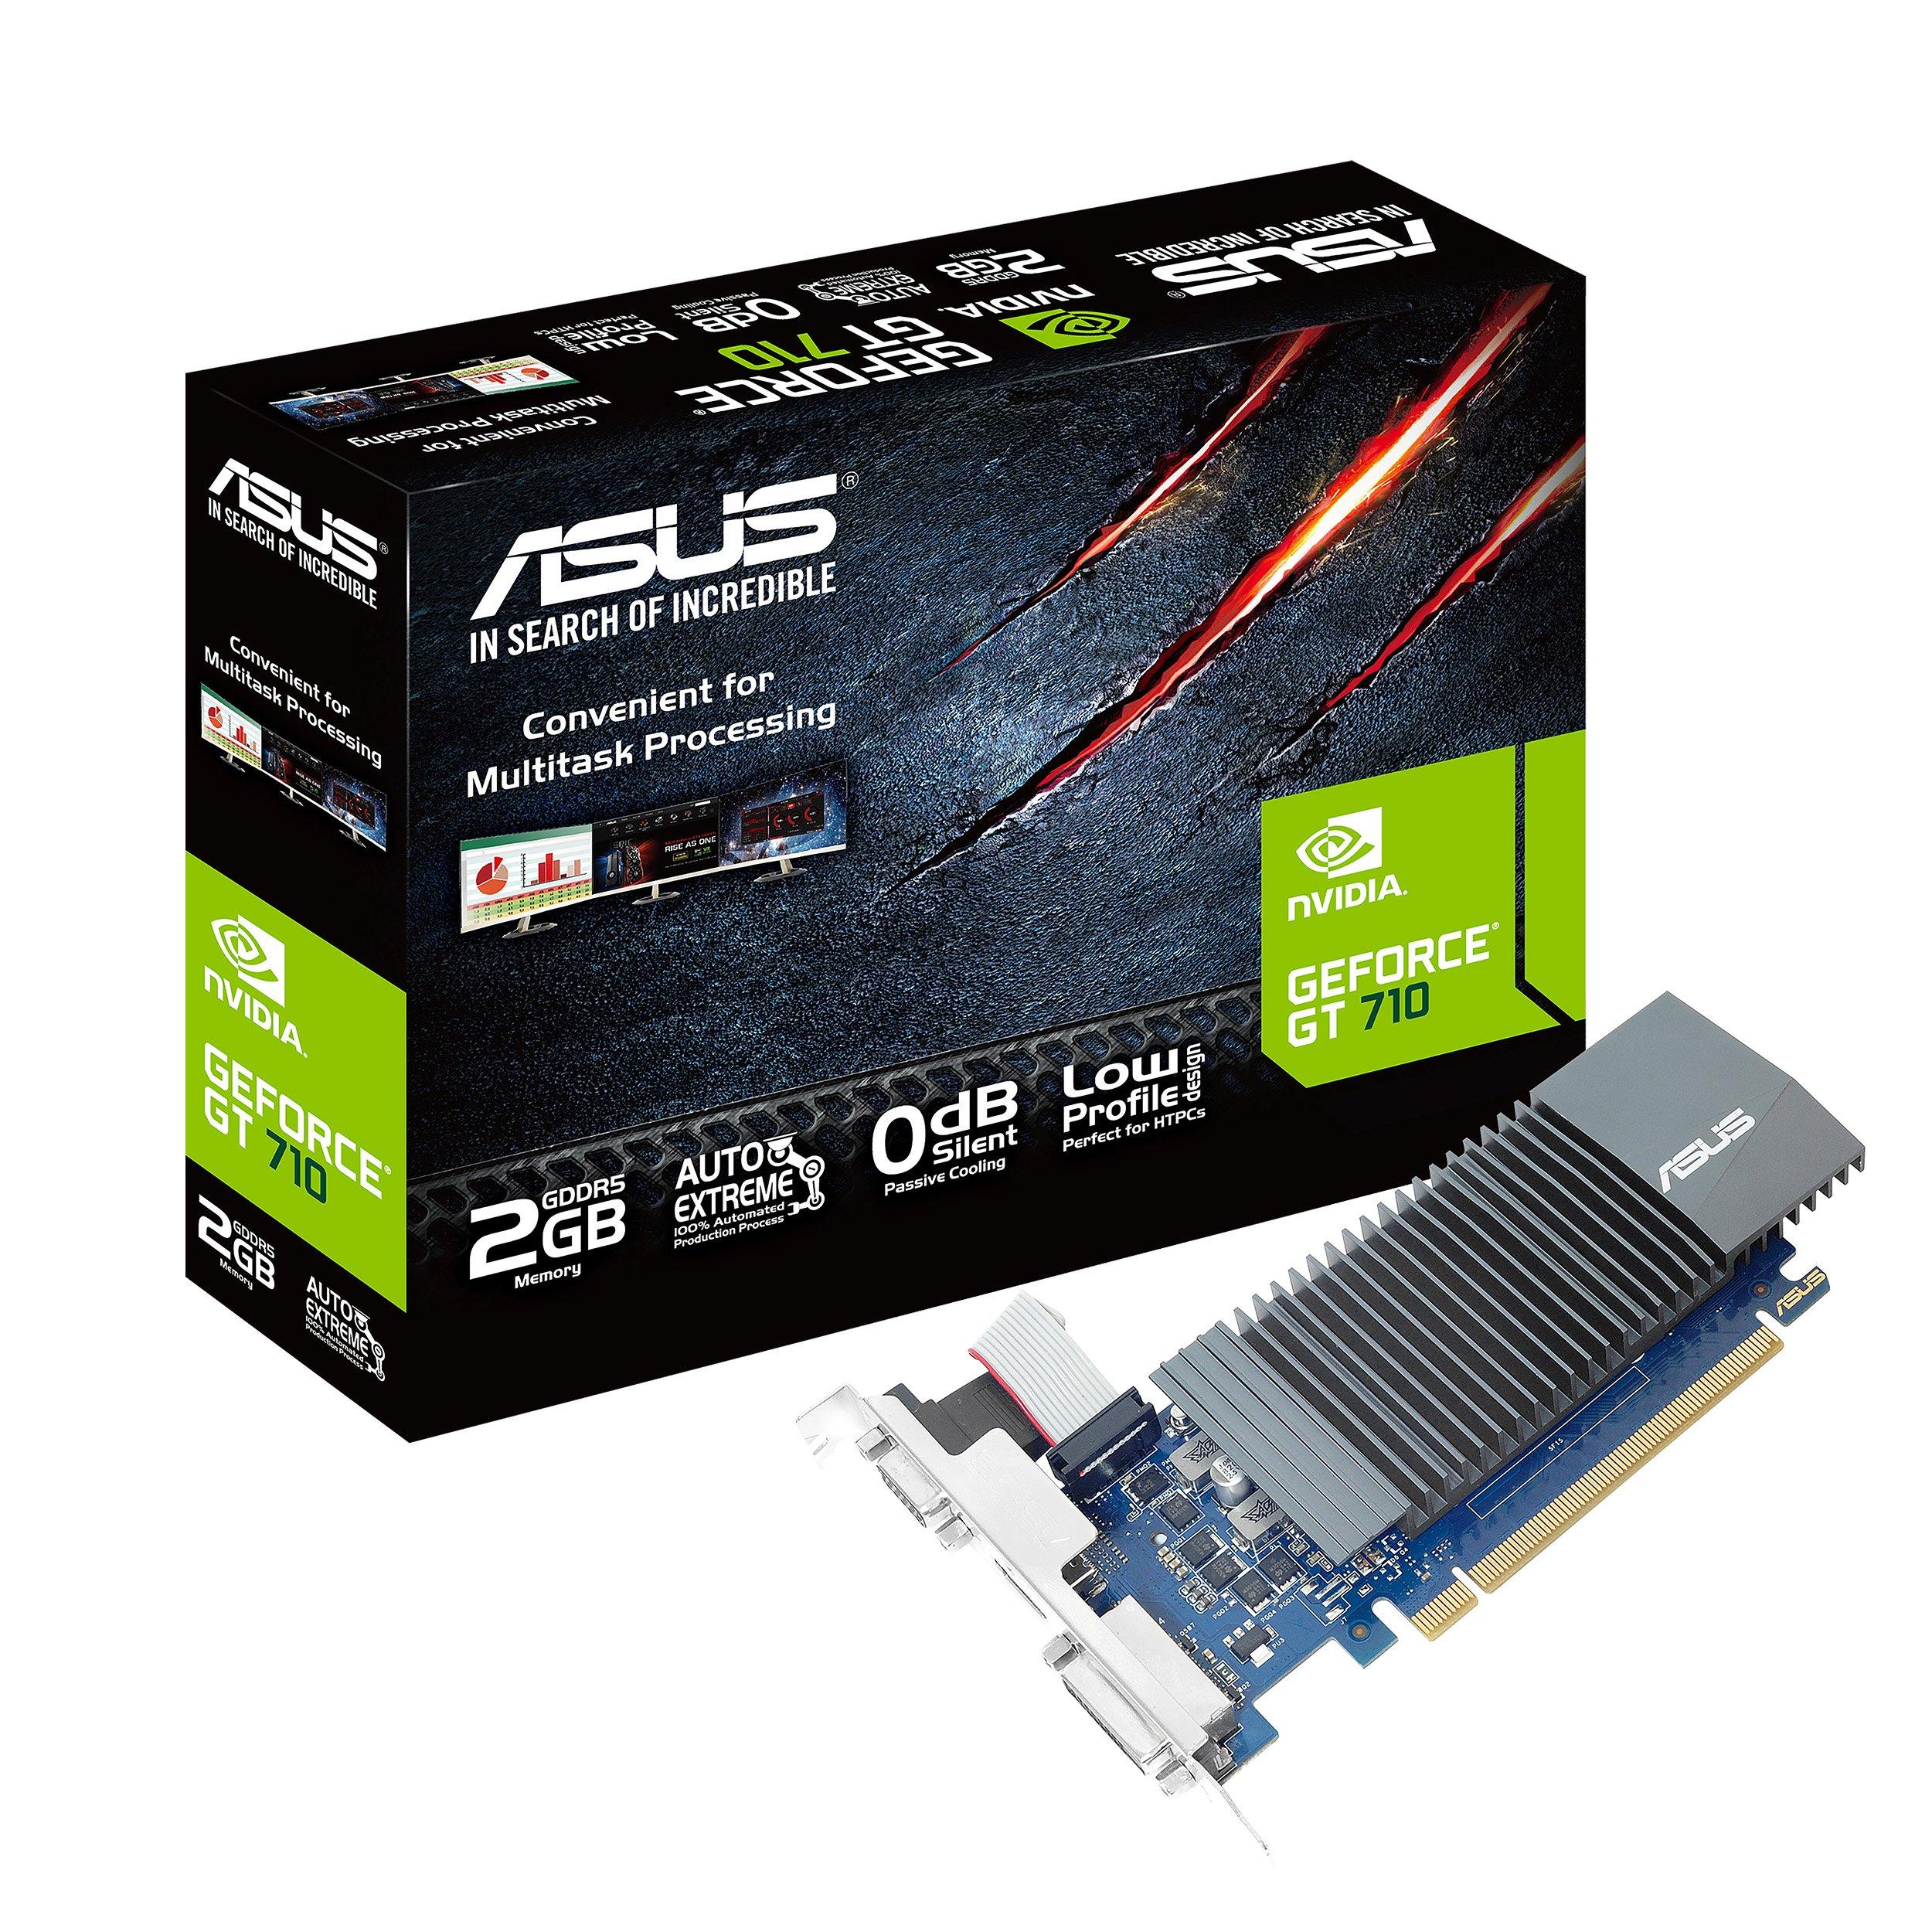 Asus GeForce GT 710 2GB GDDR5 HDMI VGA DVI Graphics Card Graphic Cards GT710-SL-2GD5-CSM GT710-SL-2GD5-CSM GT 710 Low Profile 2GB DDR5